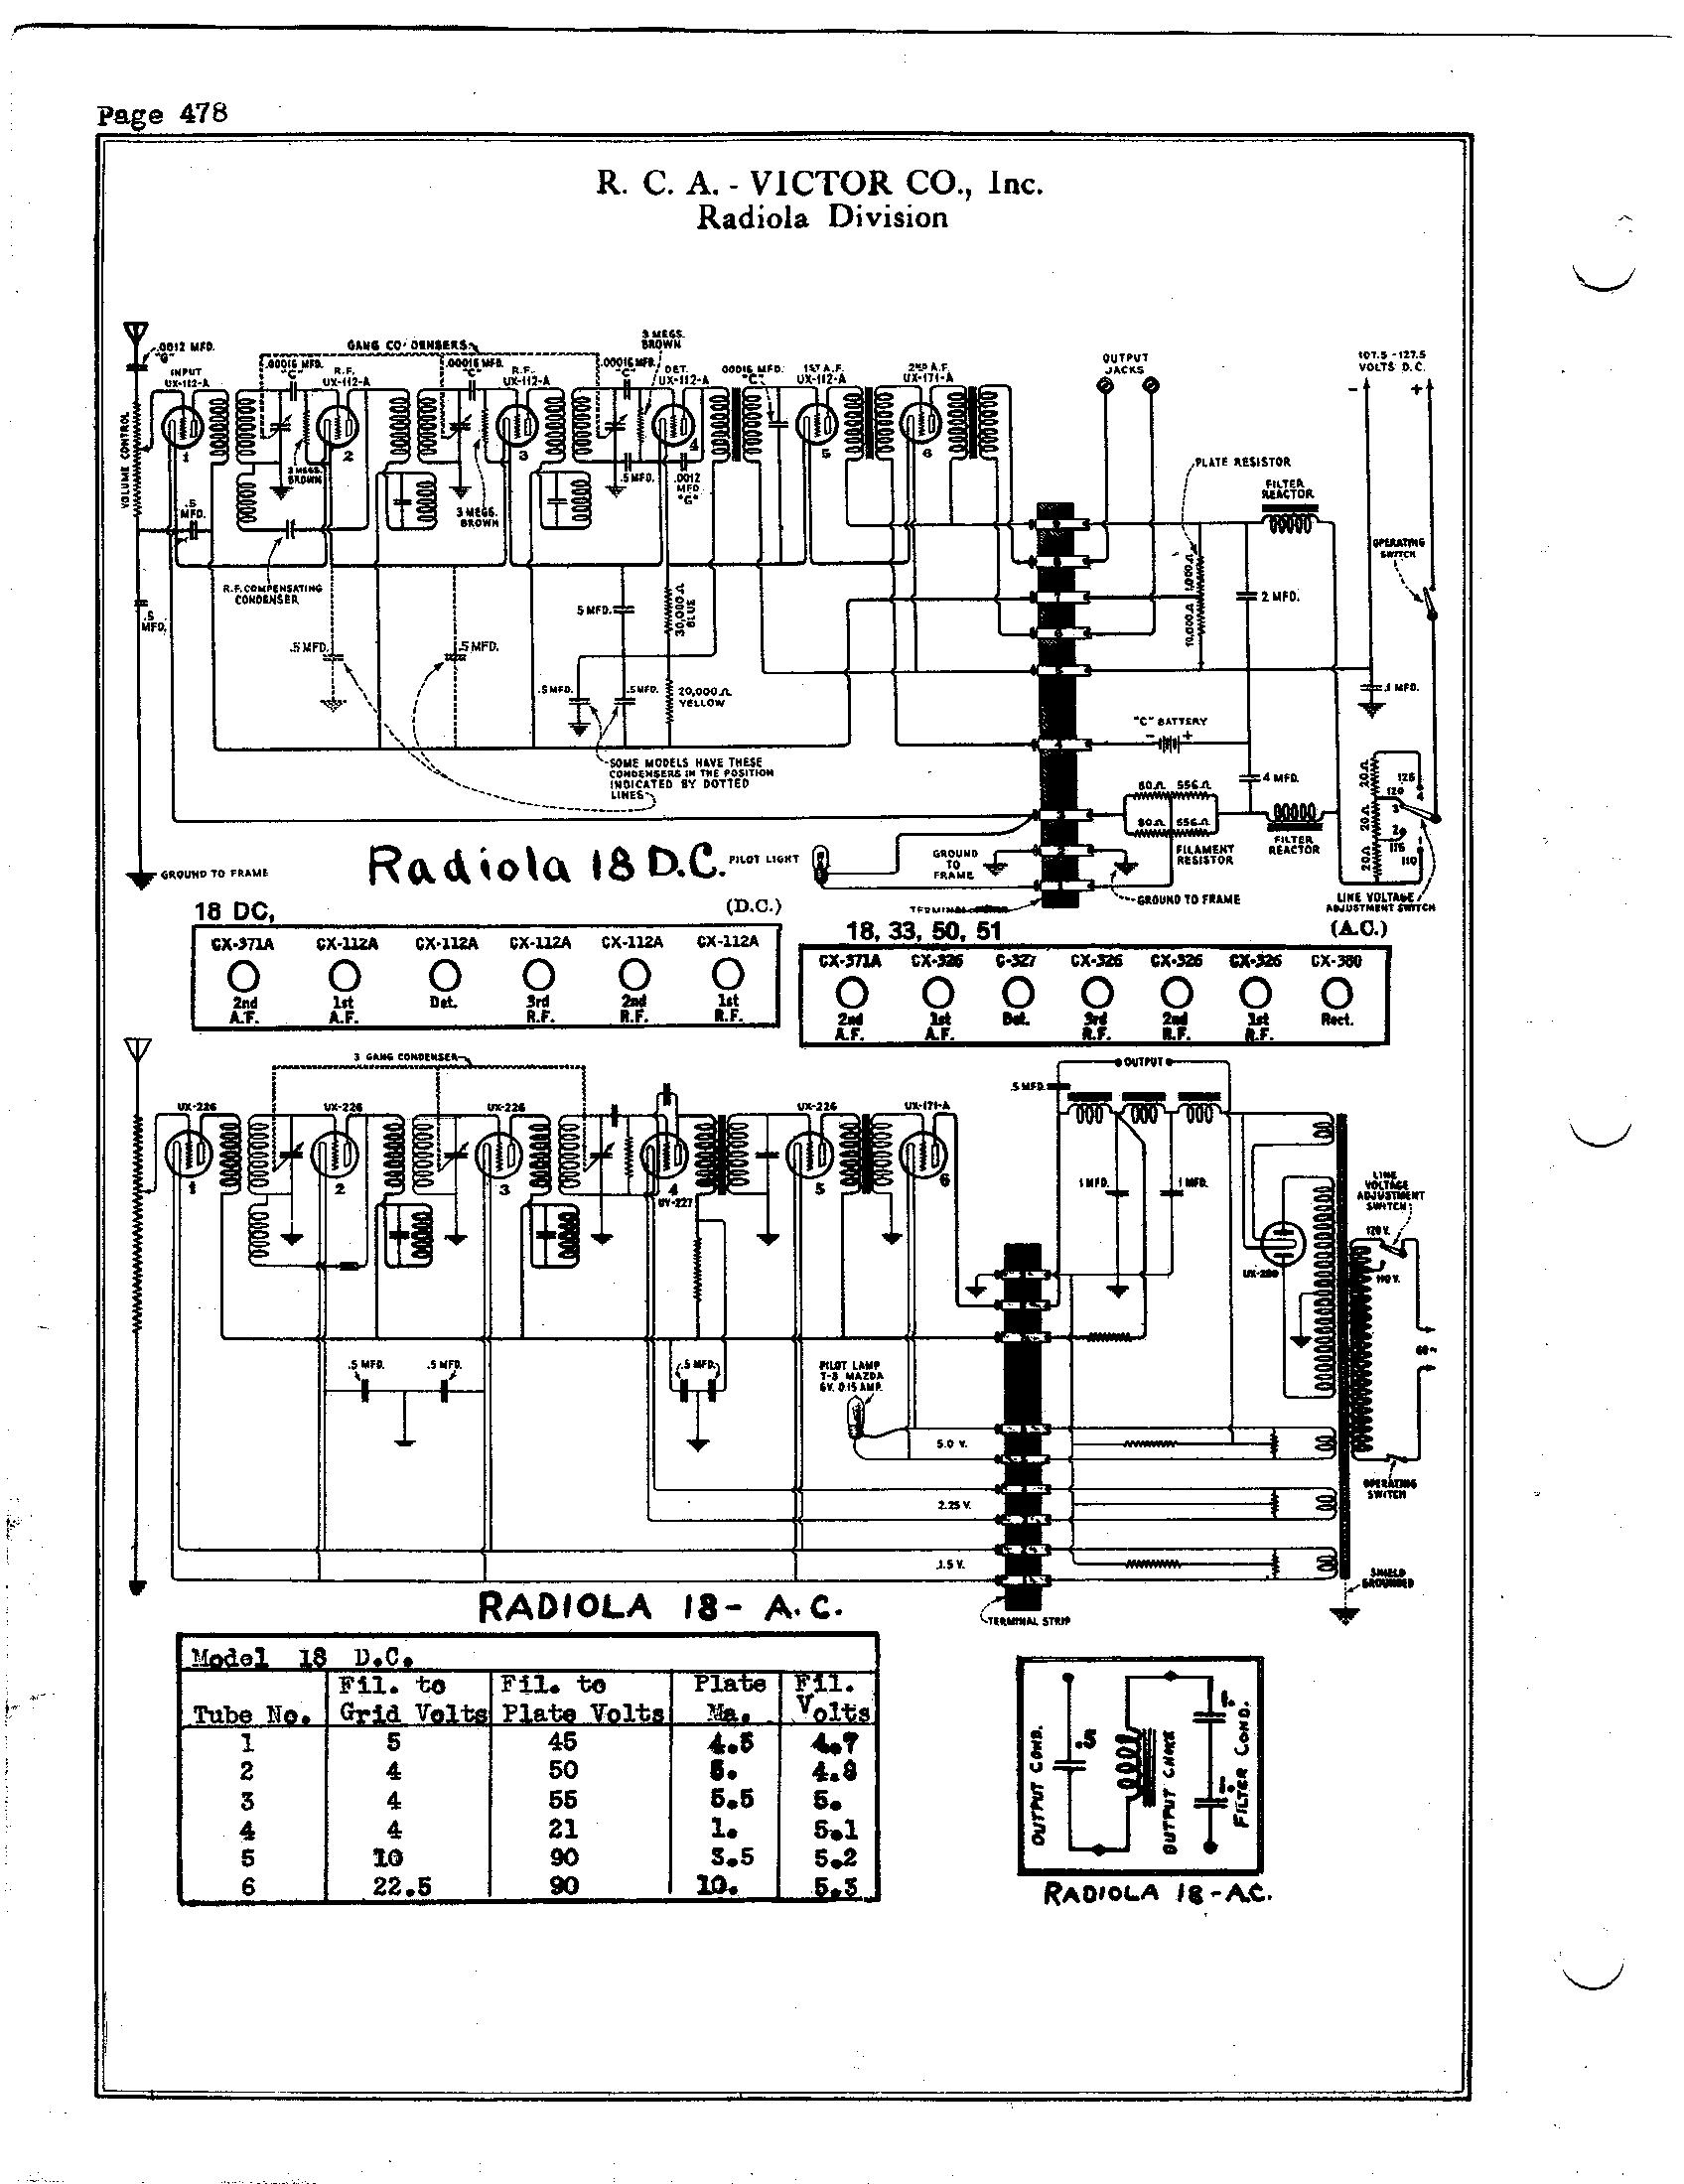 RCA Victor Co., Inc. Radiola 18 DC Schematic